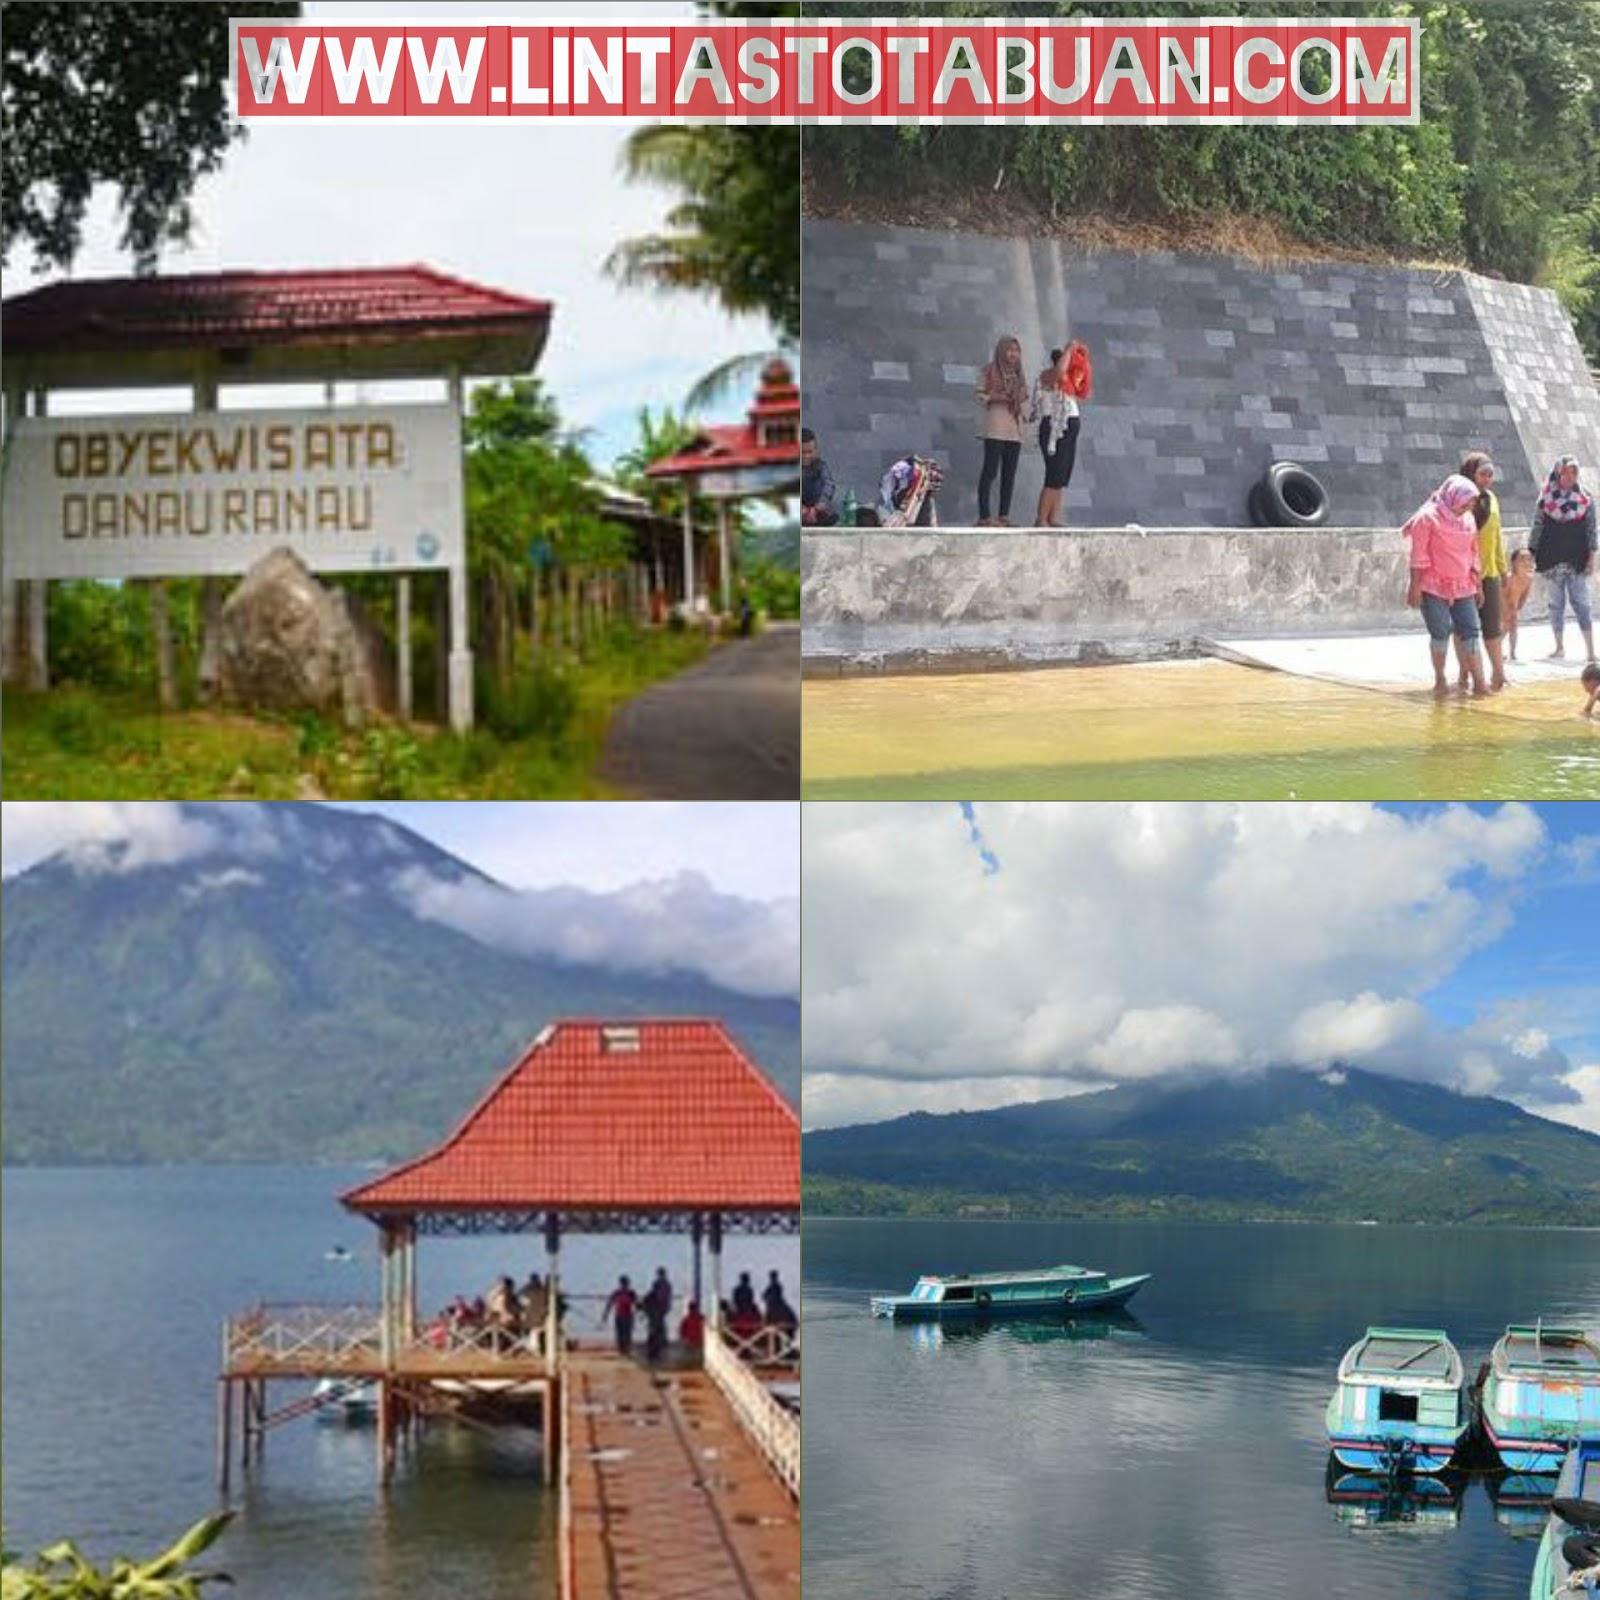 Surga Wisata Danau Ranau Lampung Barat - LintasTotabuan.com